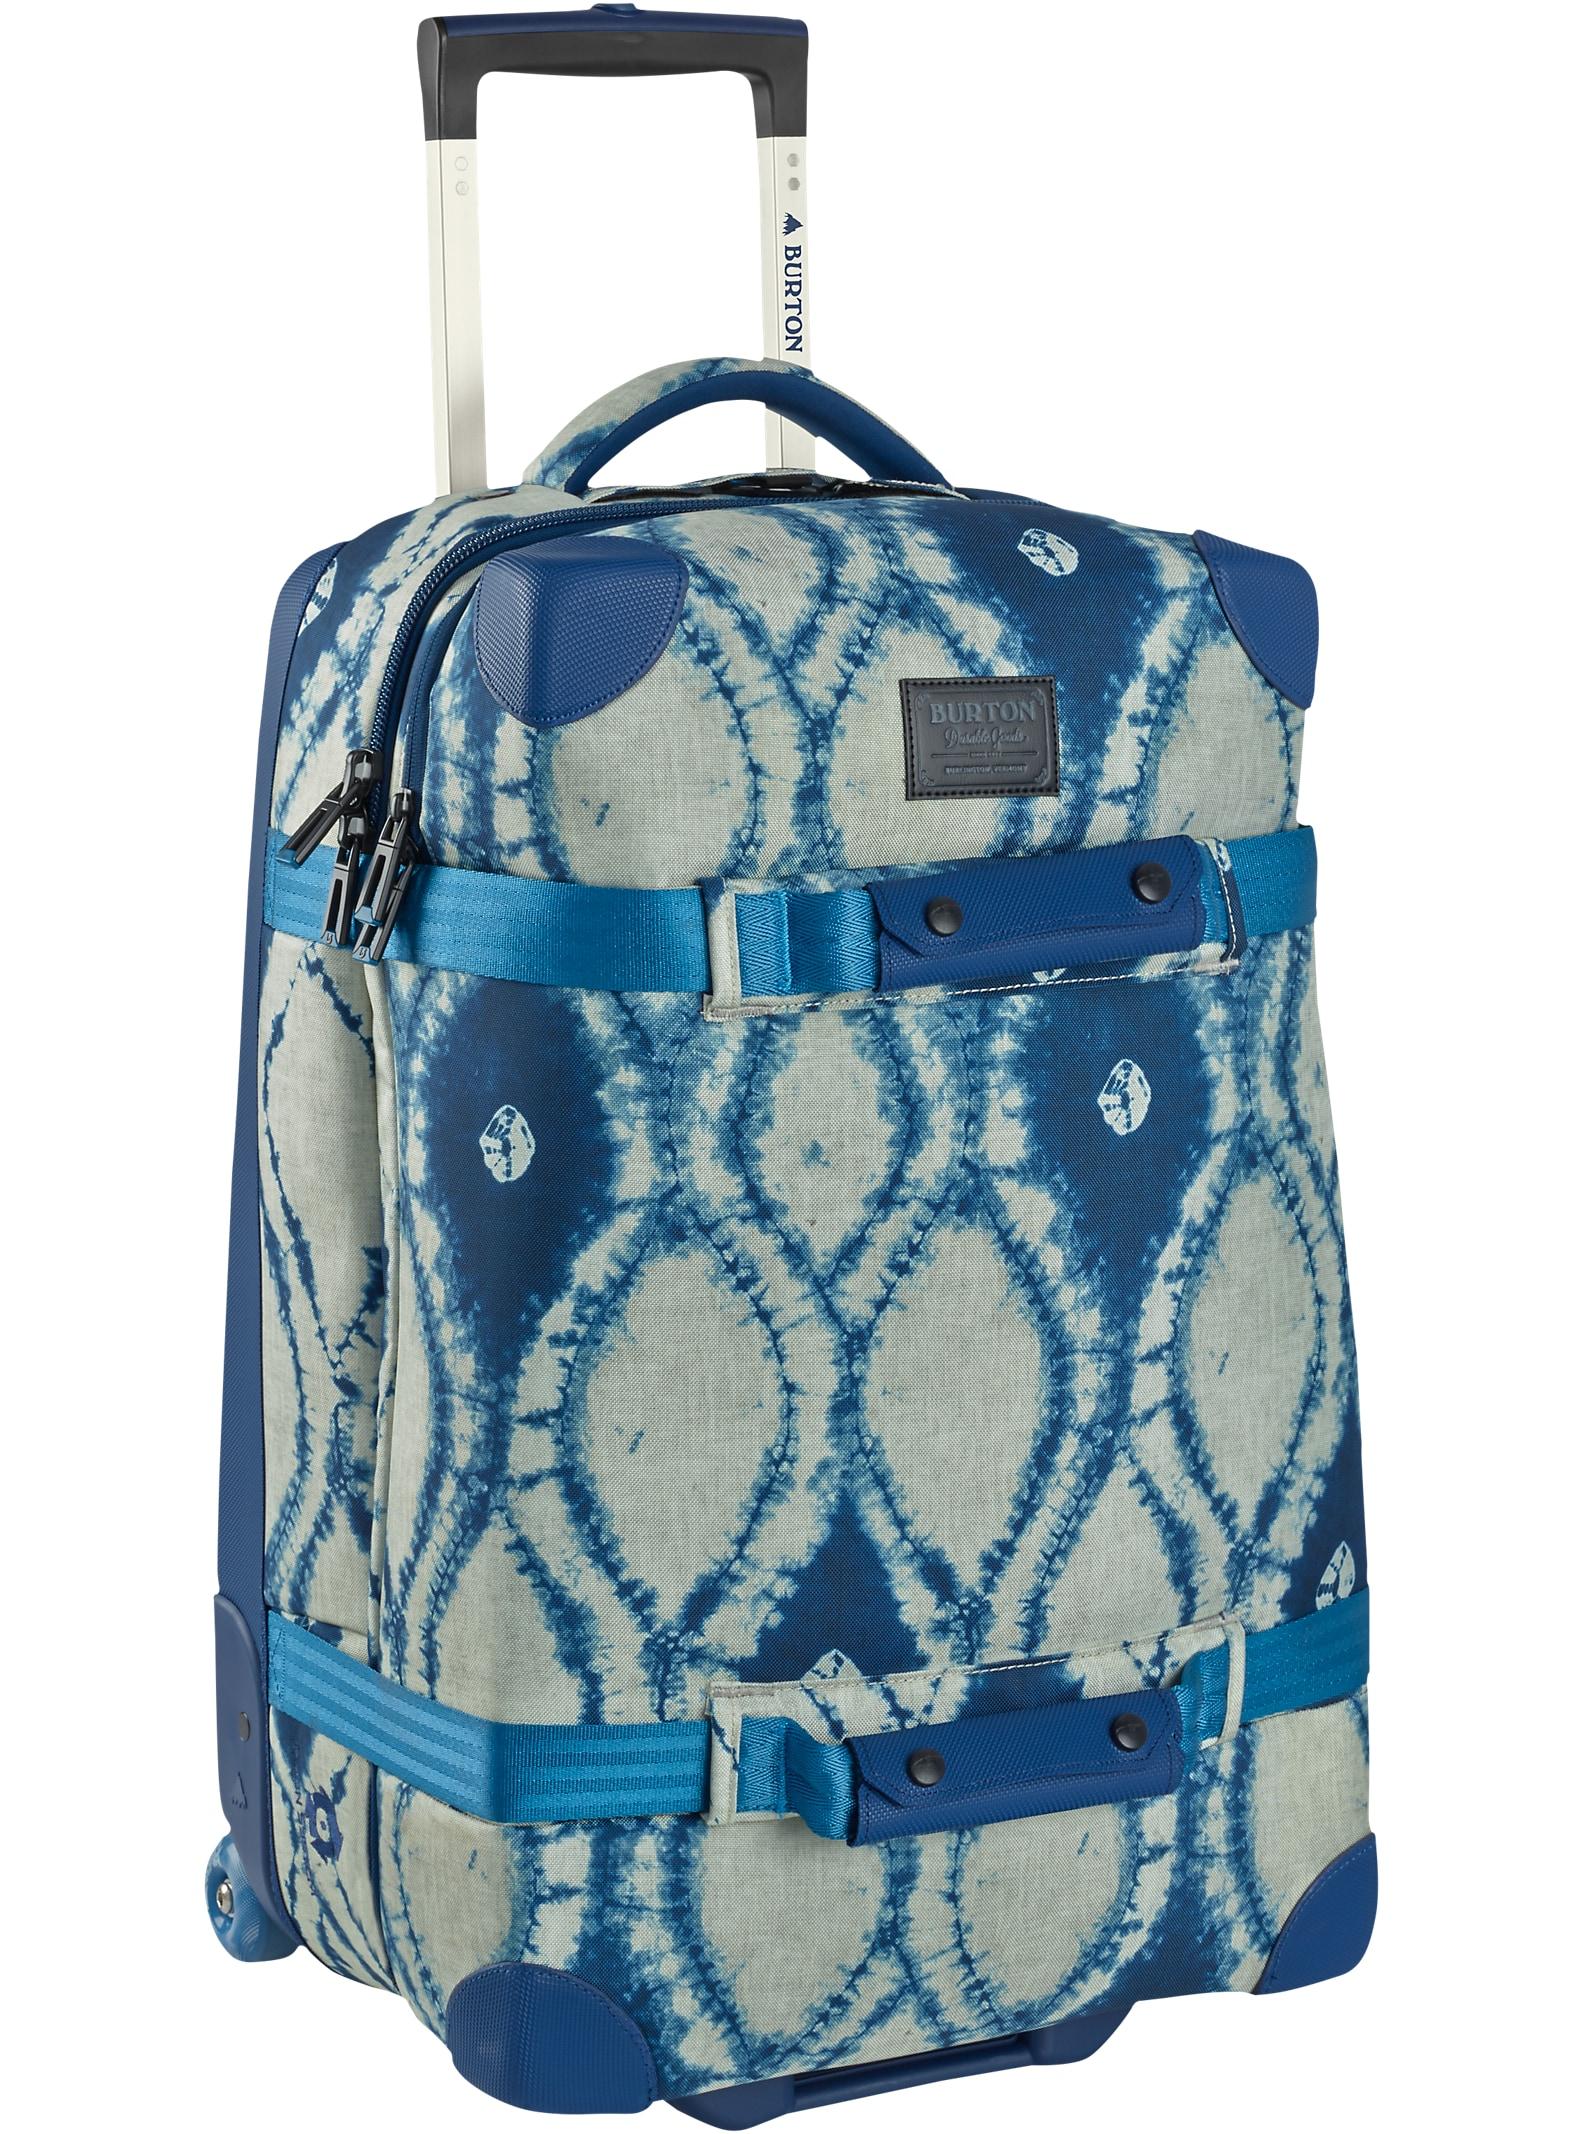 Burton Wheelie Cargo Travel Bag | Burton Snowboards Fall 15